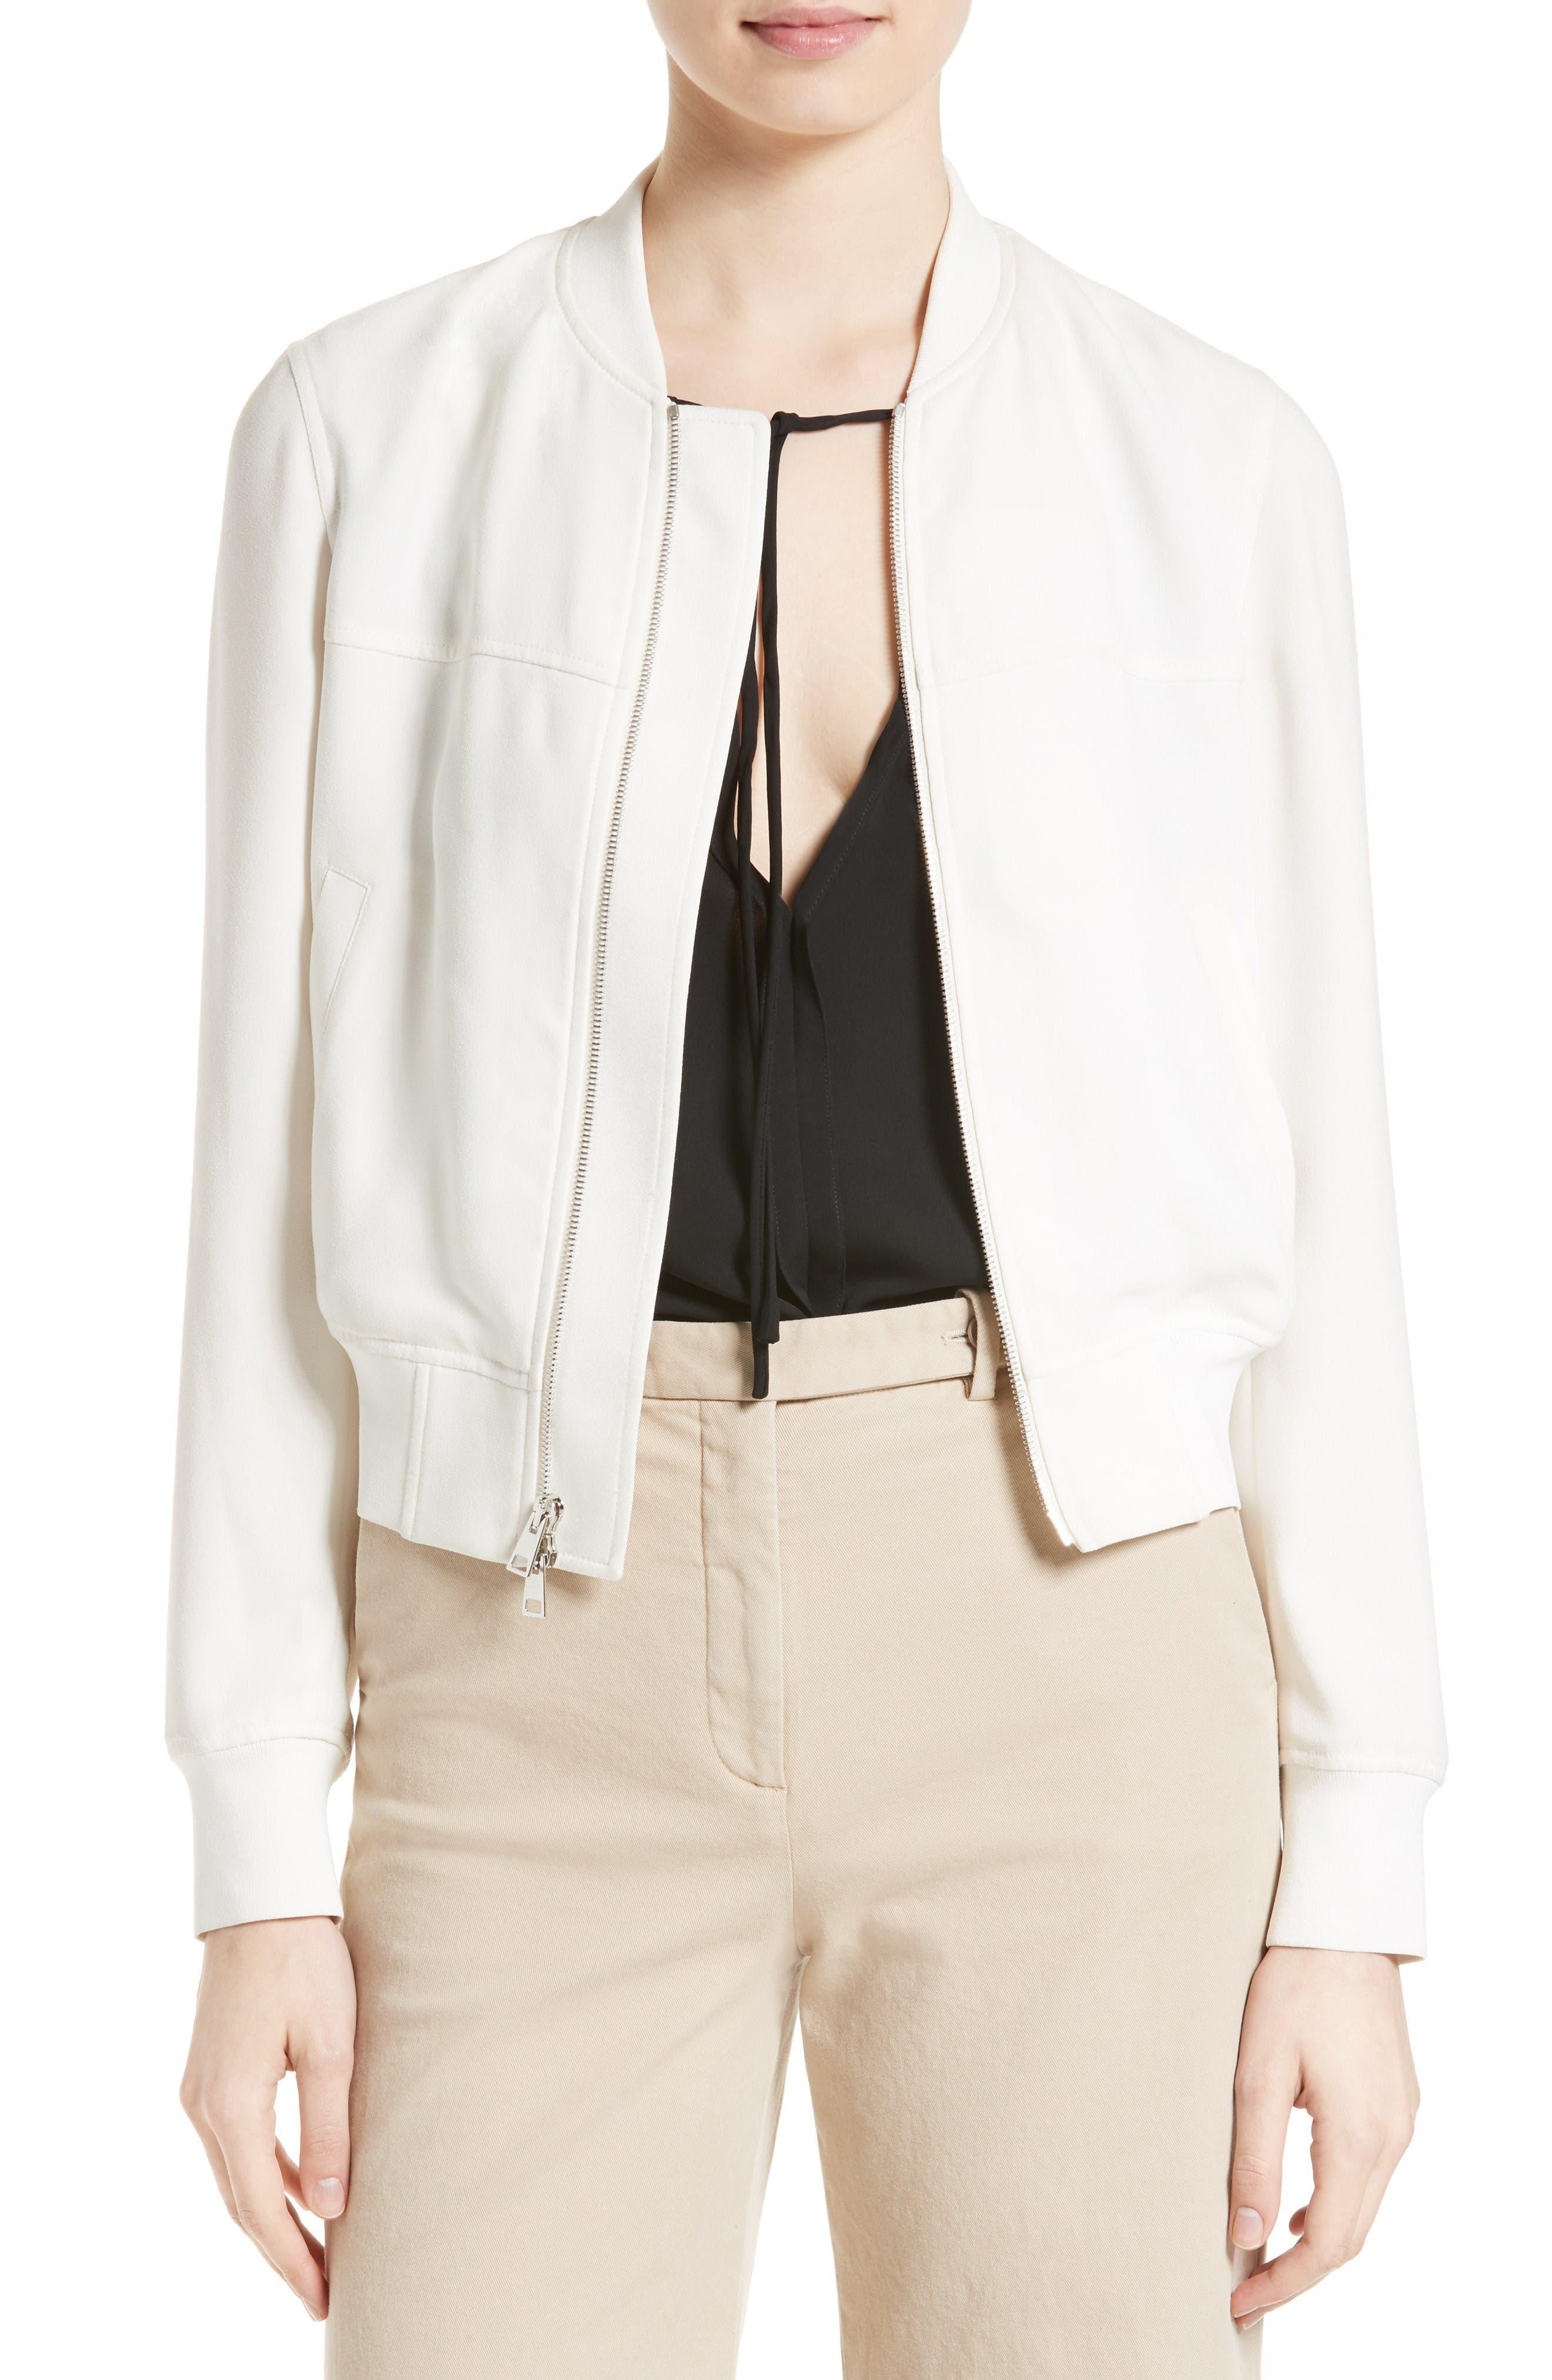 Alternate Image 1 Selected - Theory Daryette B Elevate Crepe Jacket